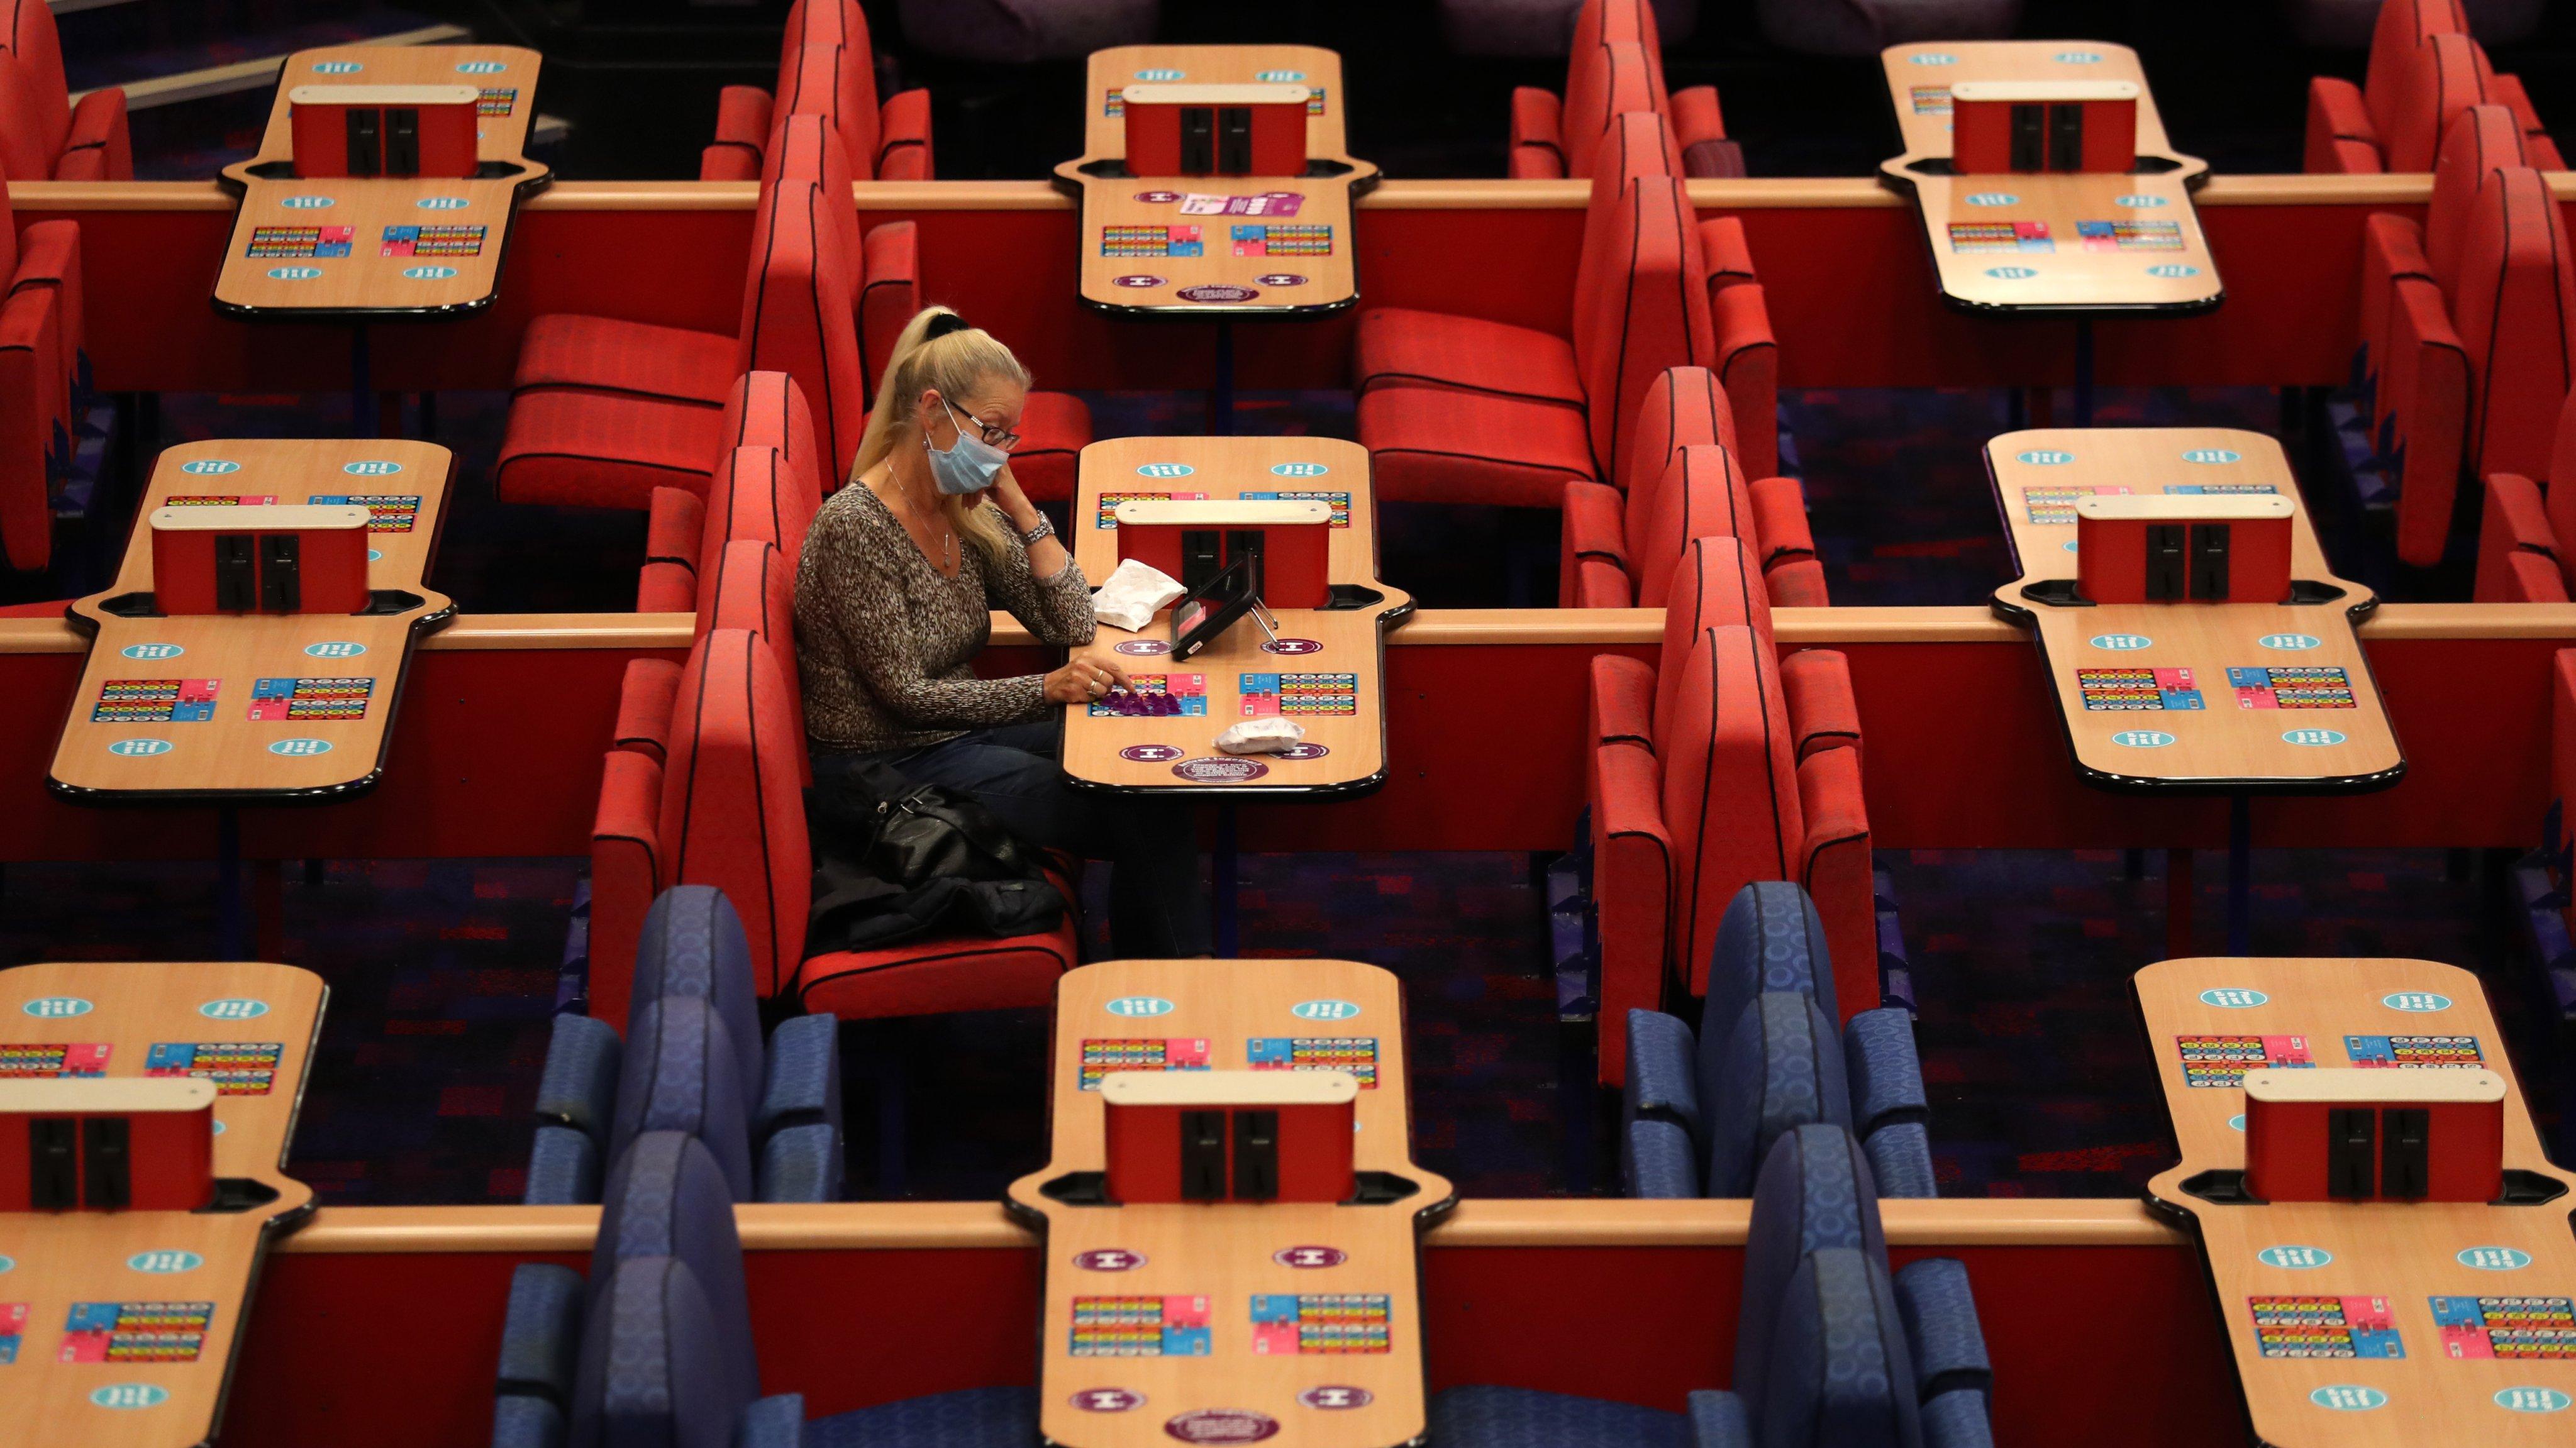 Sala de bingo, durante a pandemia Covid-19, 24 de agosto de 2020